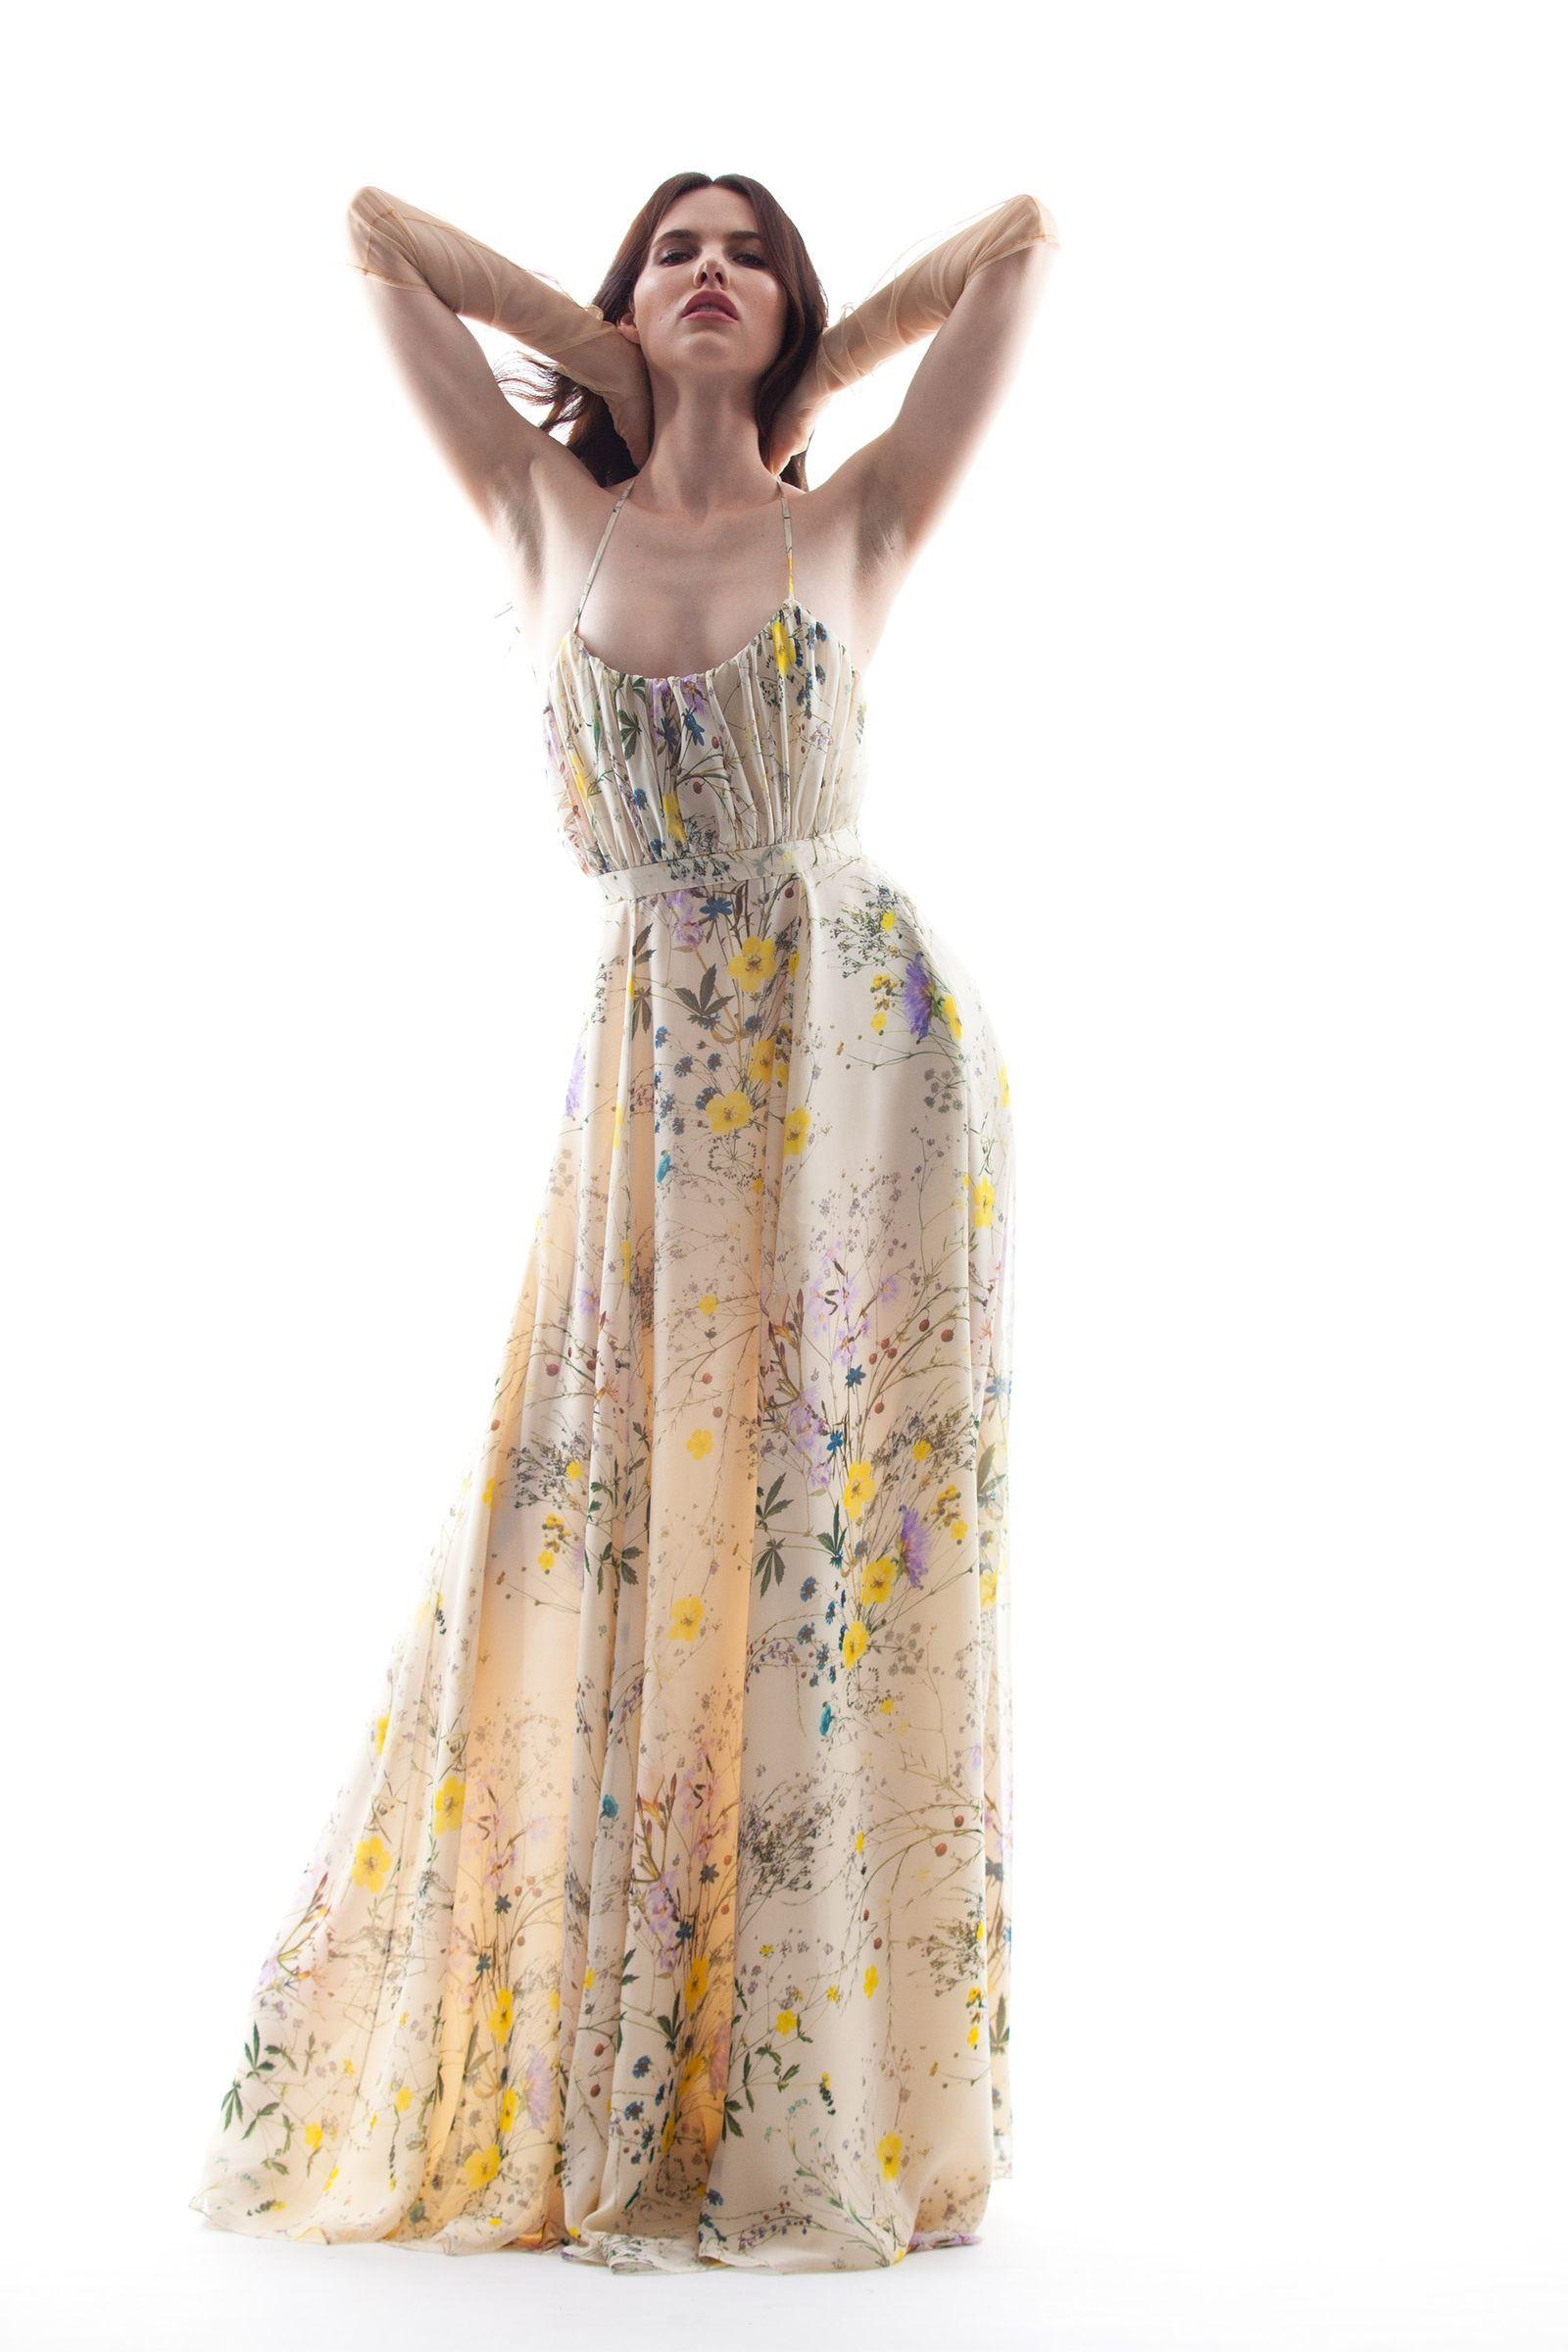 effortless looks for the boho bride boho flower crowns and